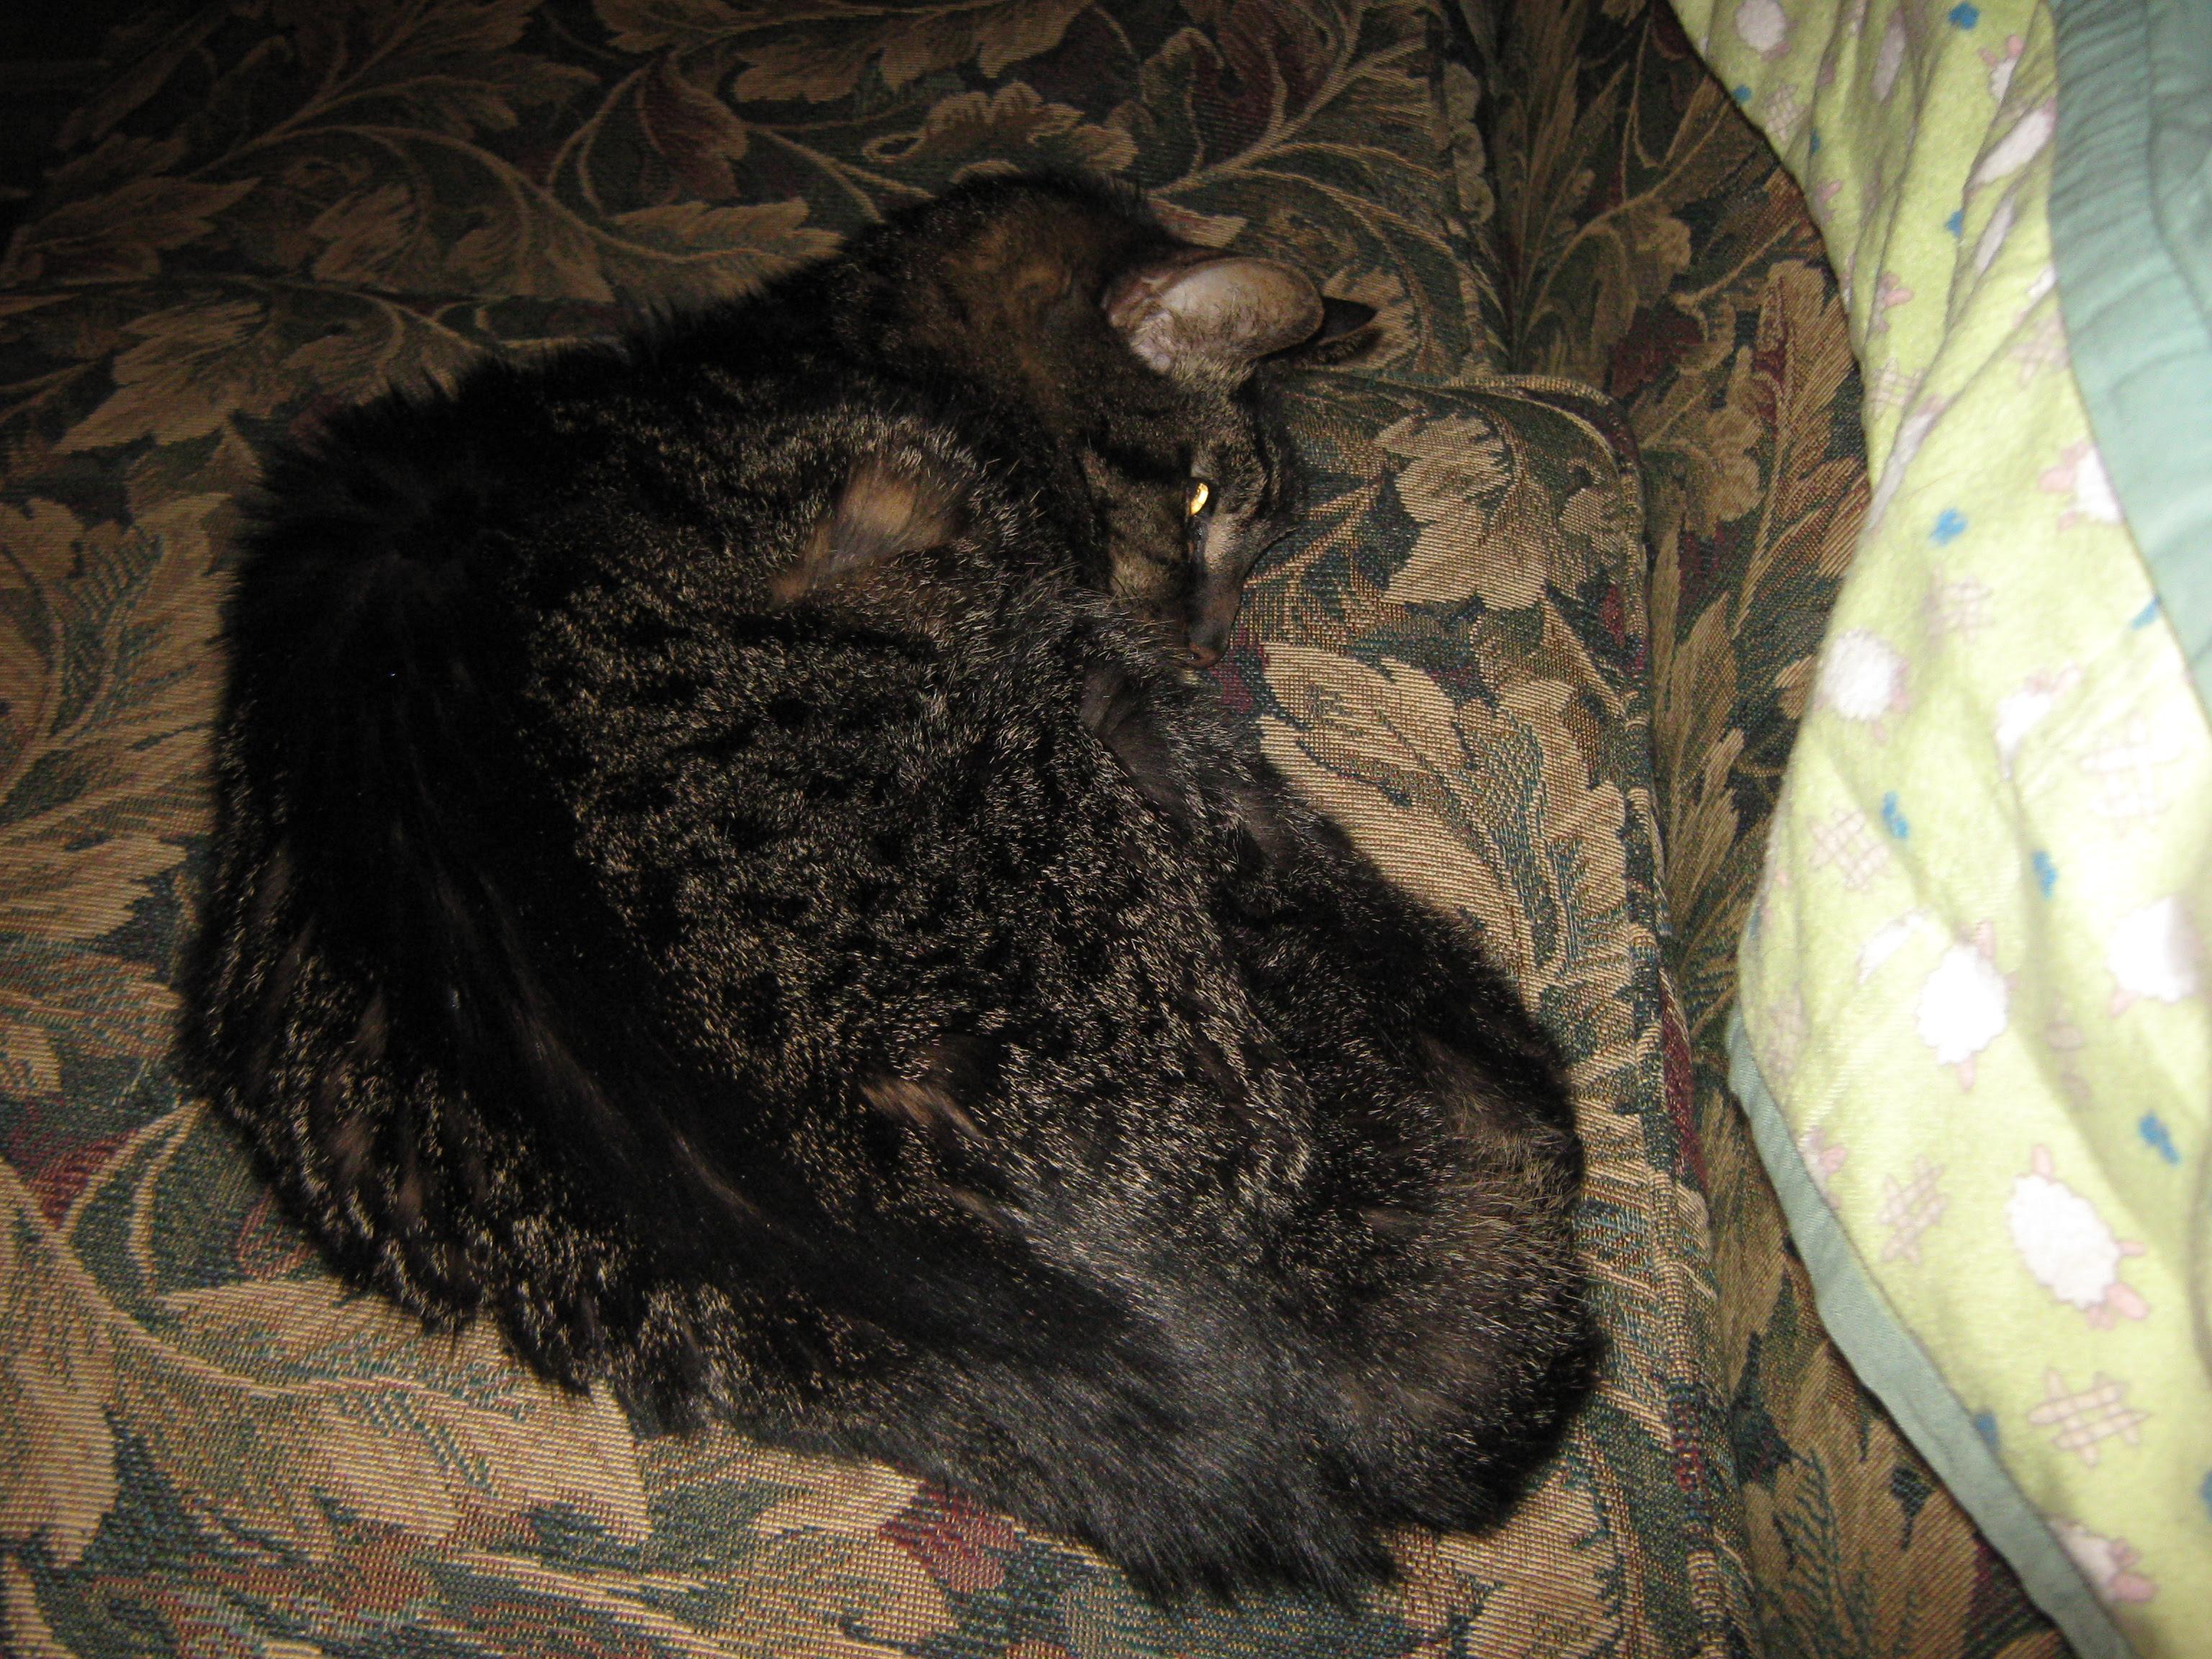 Mighty Hunter, asleep in a basket